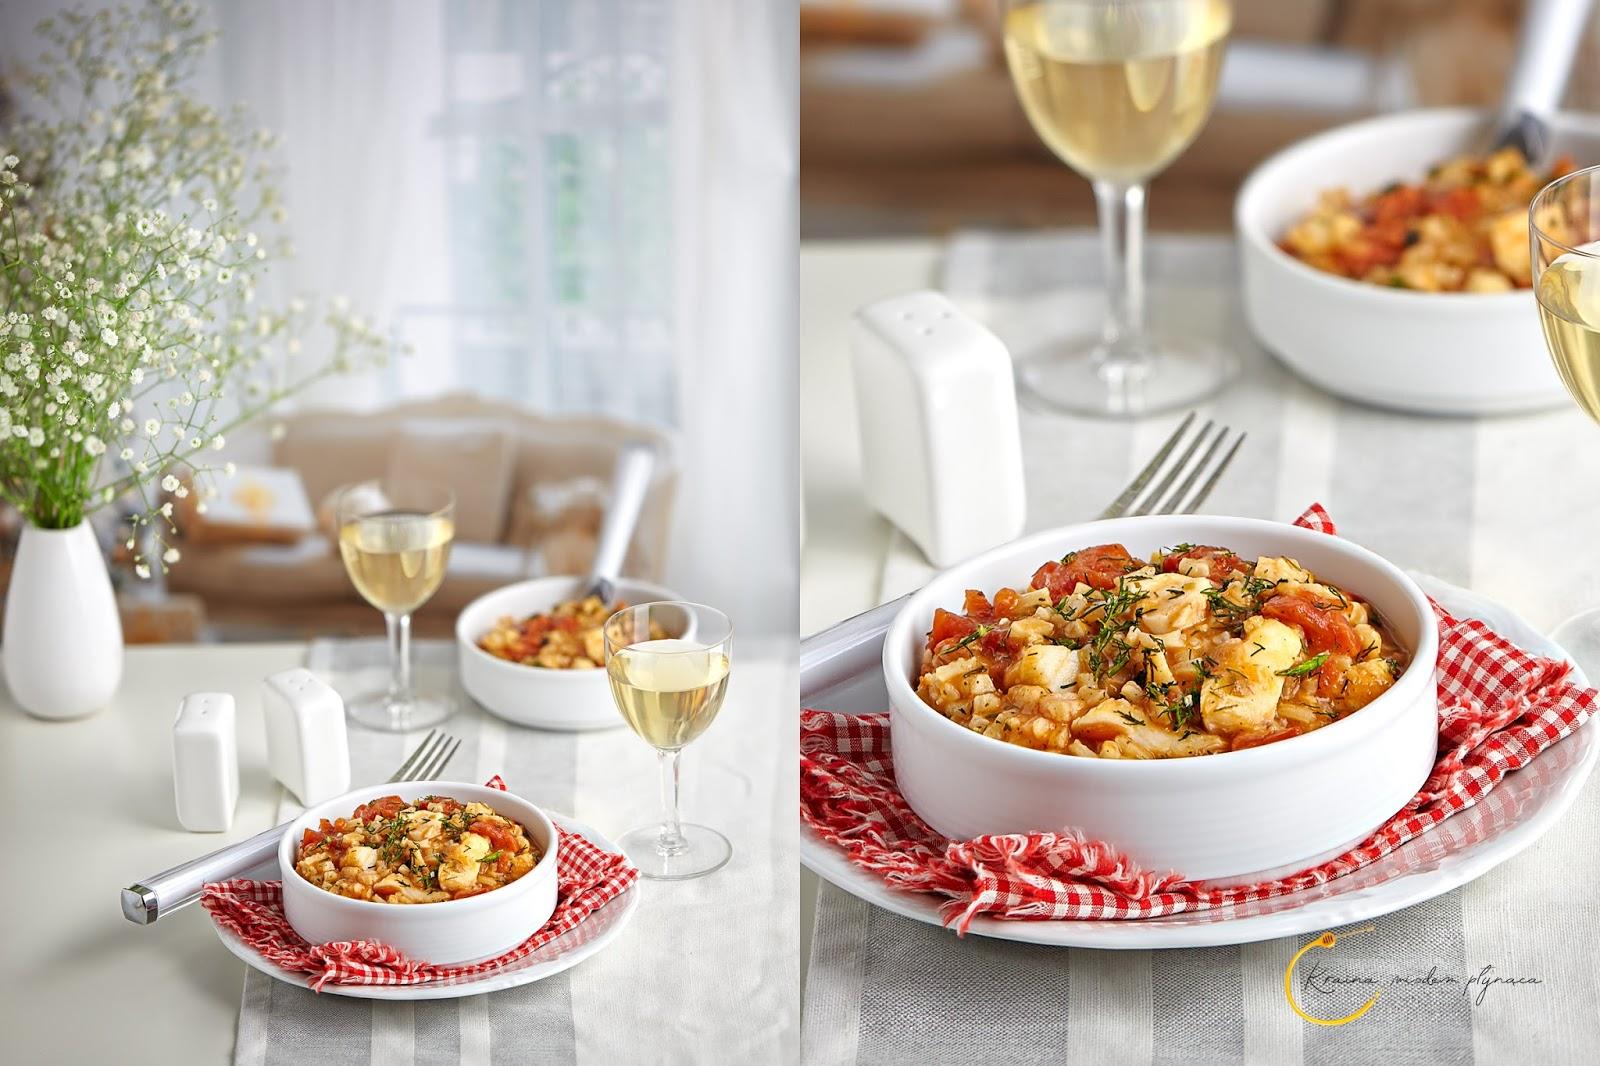 risotto z pomidorami i dorszem, risotto pomidorowe, risotto z rybą, risotto bez wina, kraina miodem płynąca, fotografia kulinarna